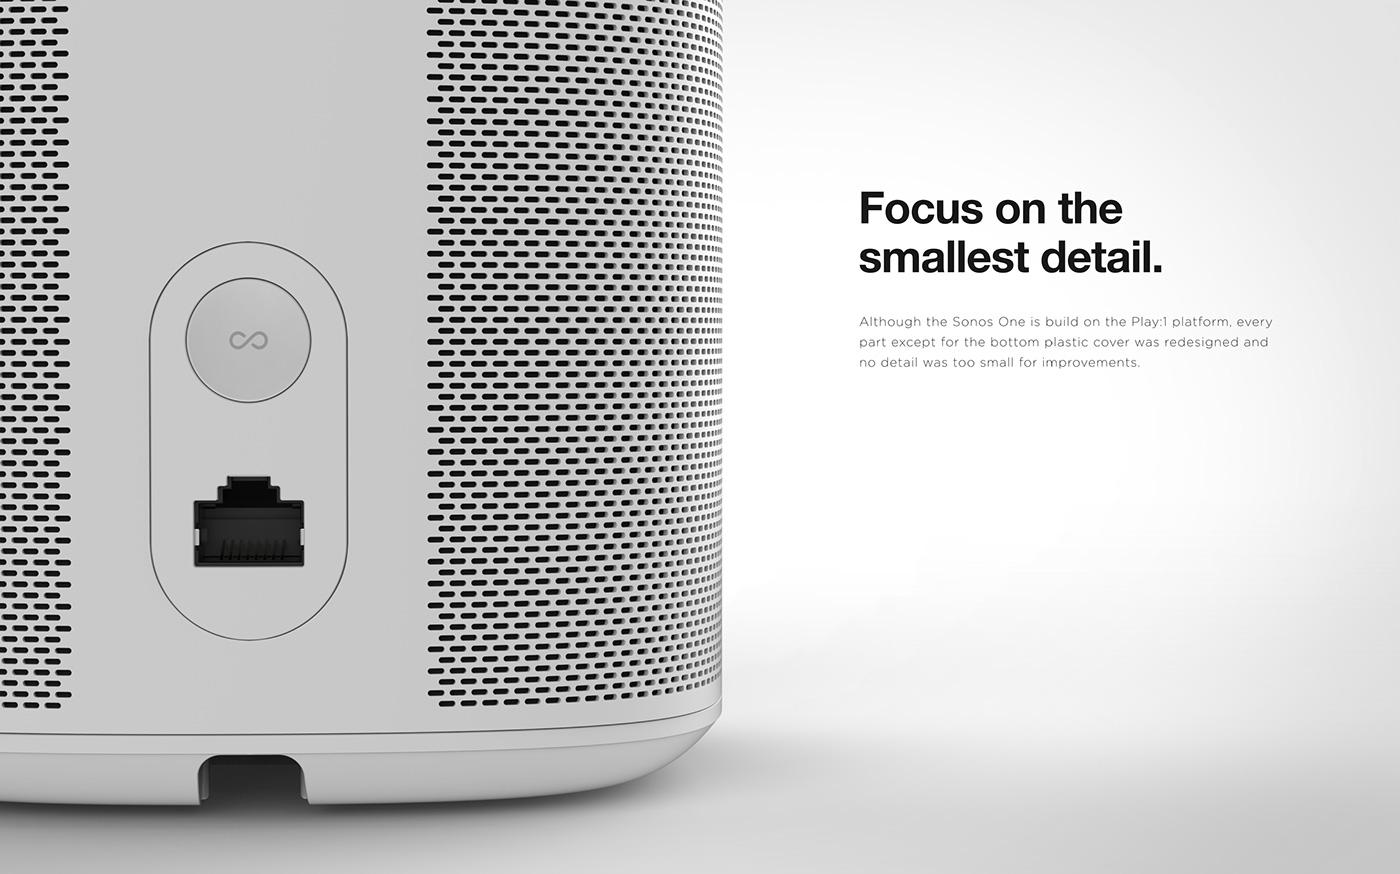 voice smartspeaker Sonos One sonos one Farfield voice microphones Voice assistant sound home